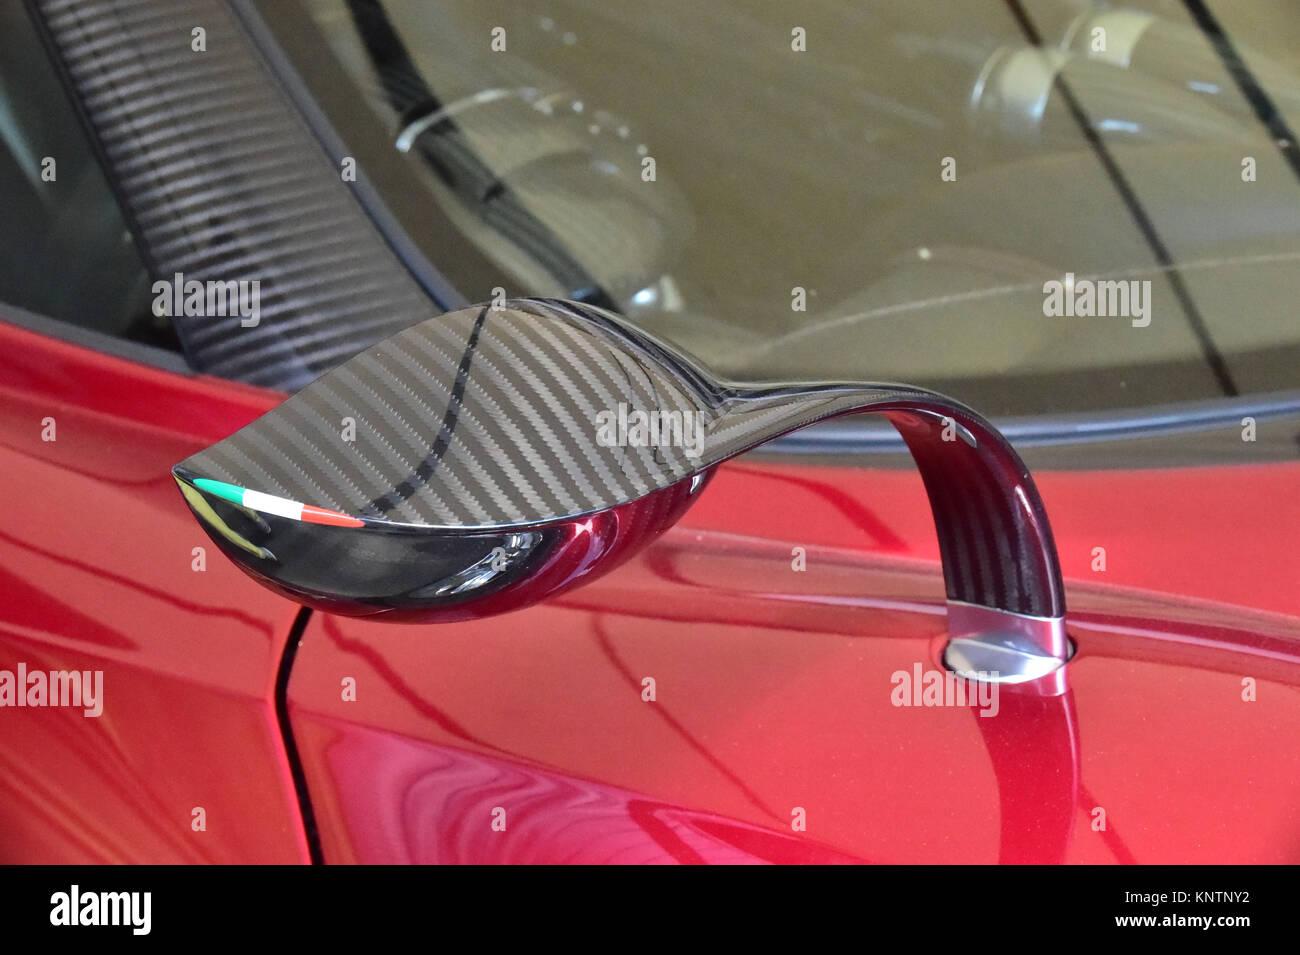 Carbon Fibre Wing Stock Photos & Carbon Fibre Wing Stock Images - Alamy